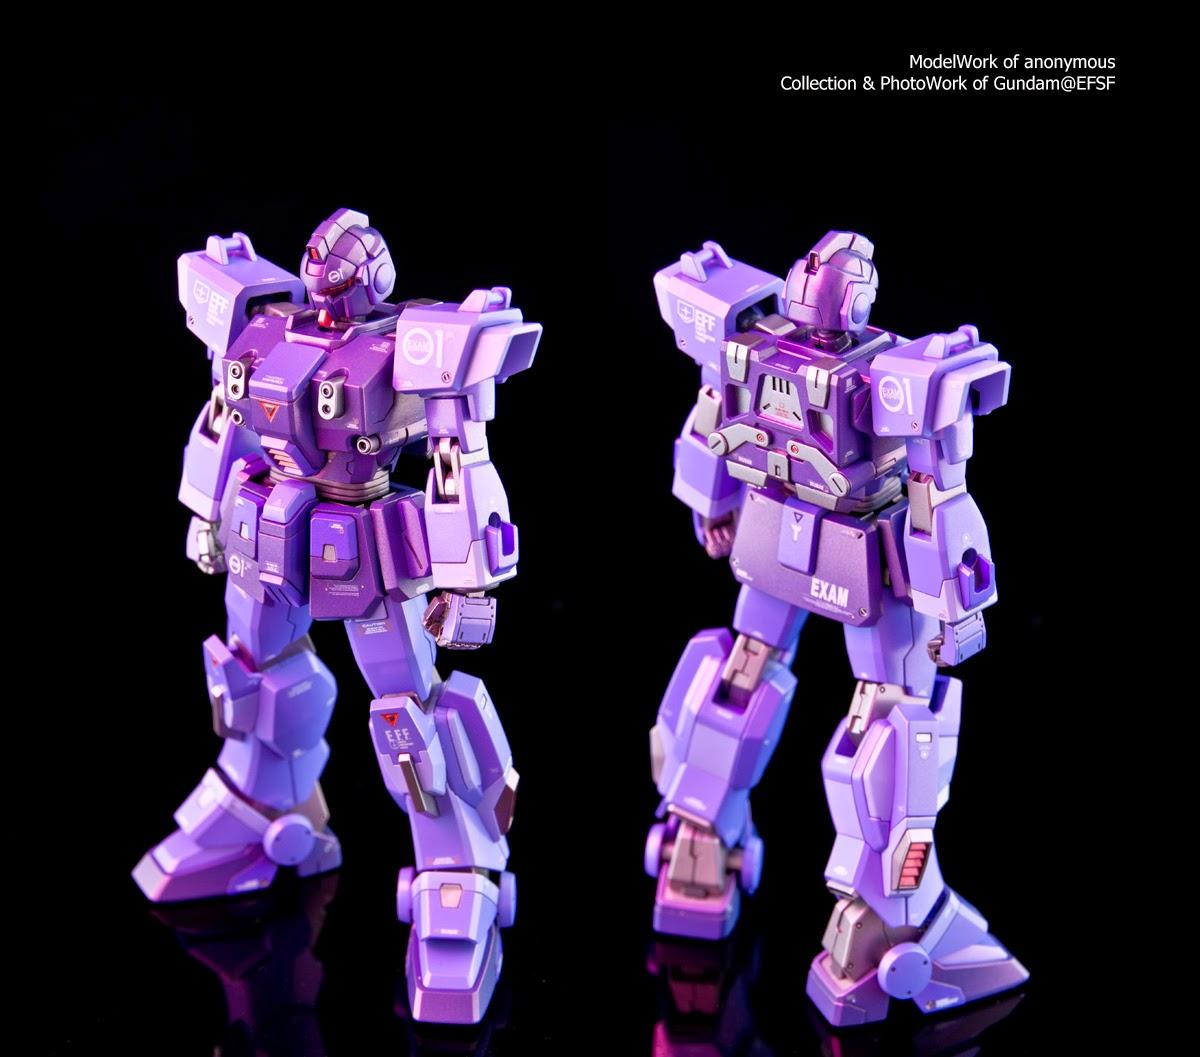 RX-79-BD1【Blue Destiny 1号機 】EXAMシステムを起動! - Gundam@EFSF - Gundam@EFSF的白色基地